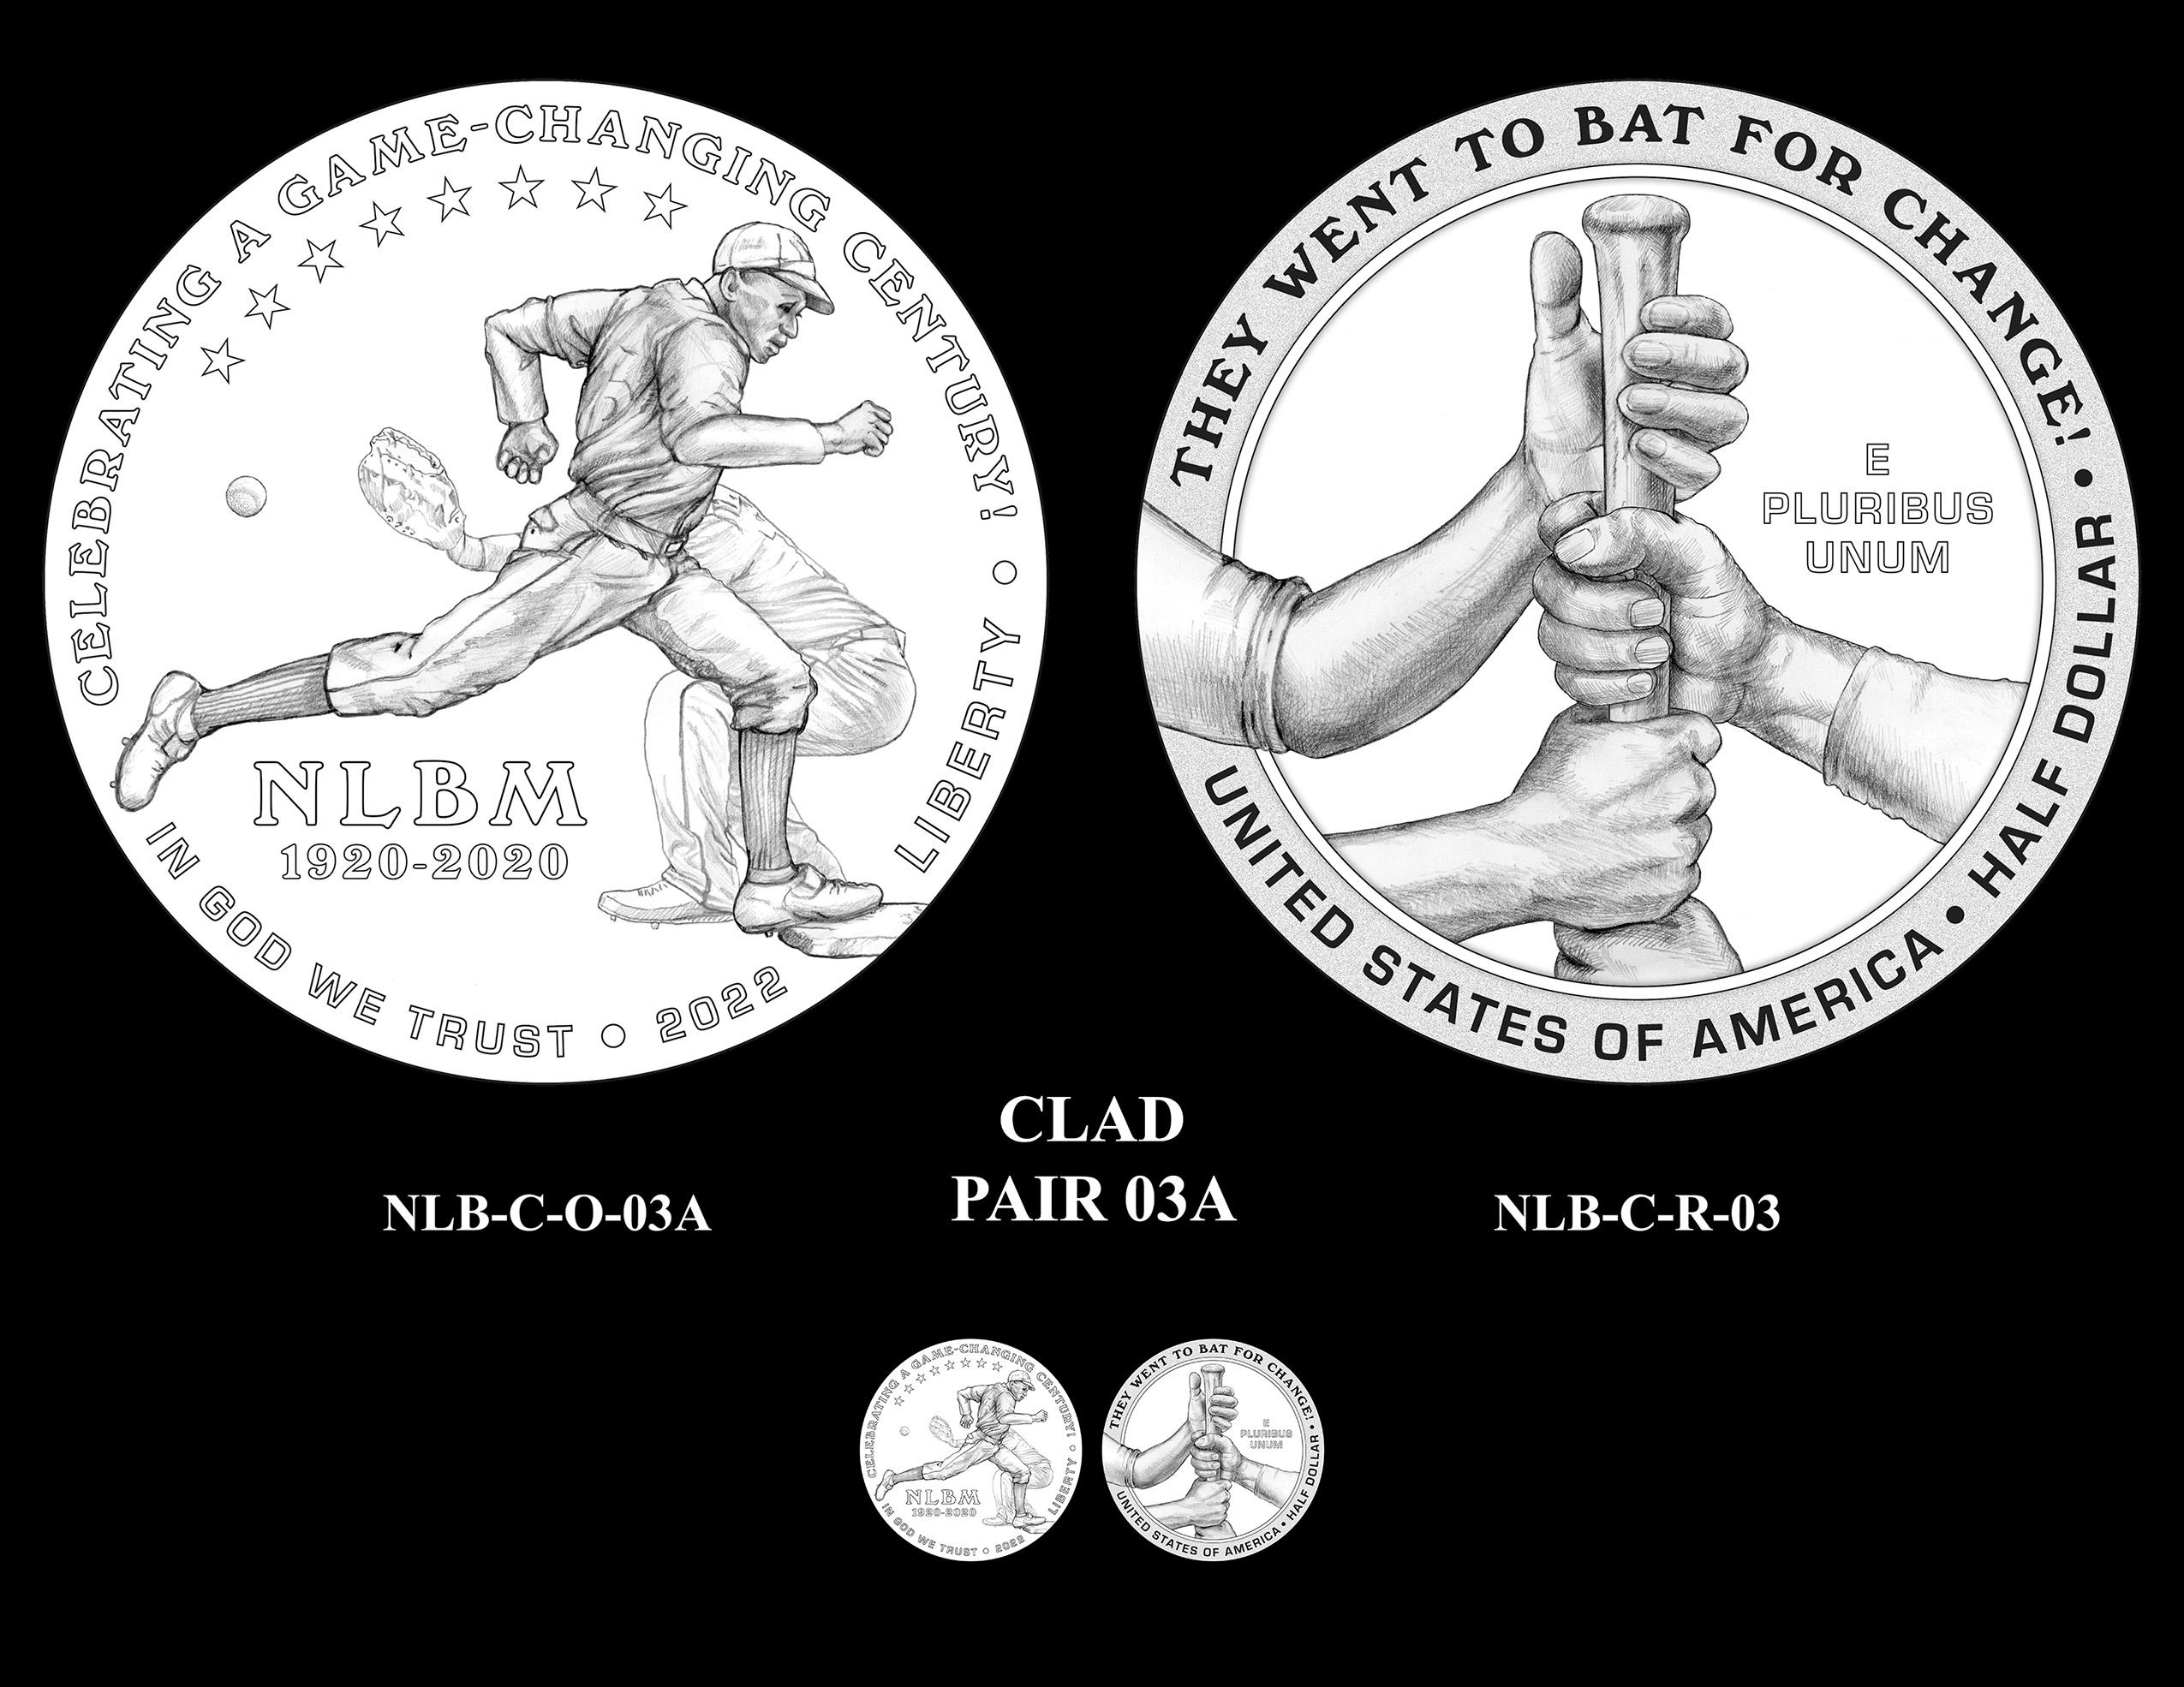 Clad Pair 03A -- Negro Leagues Baseball Commemorative Coin Program